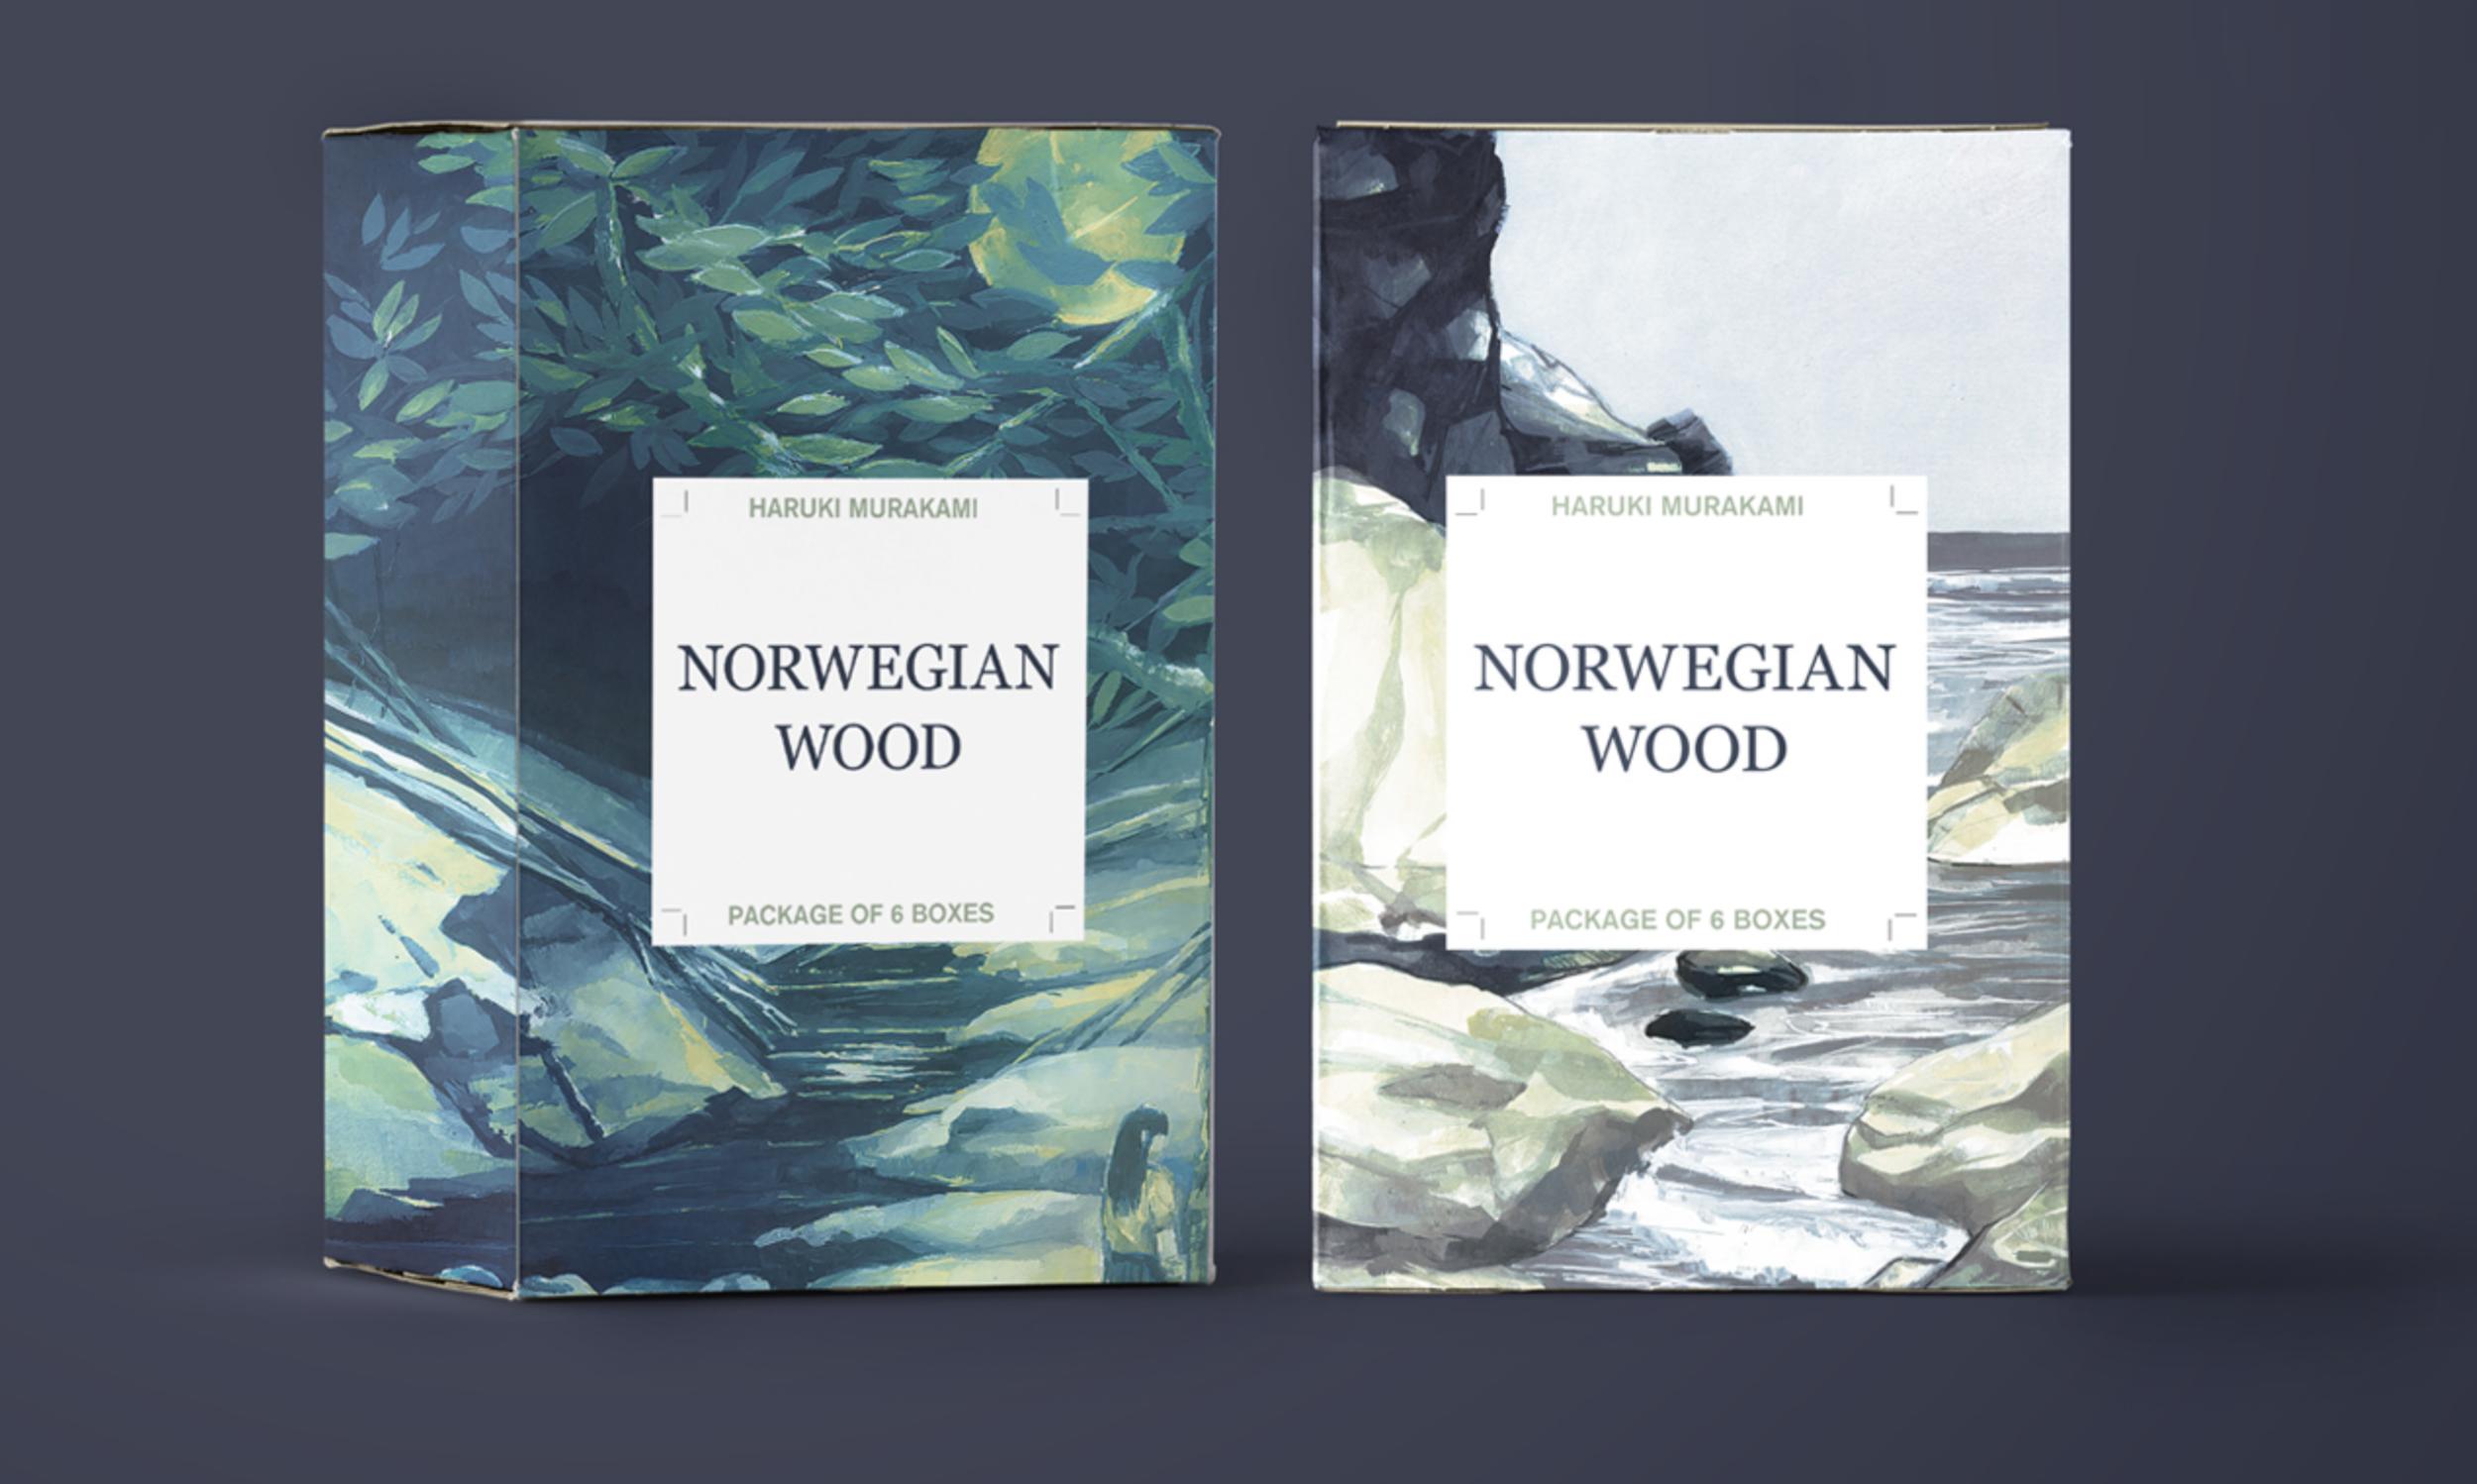 norwegianwoodpage.png